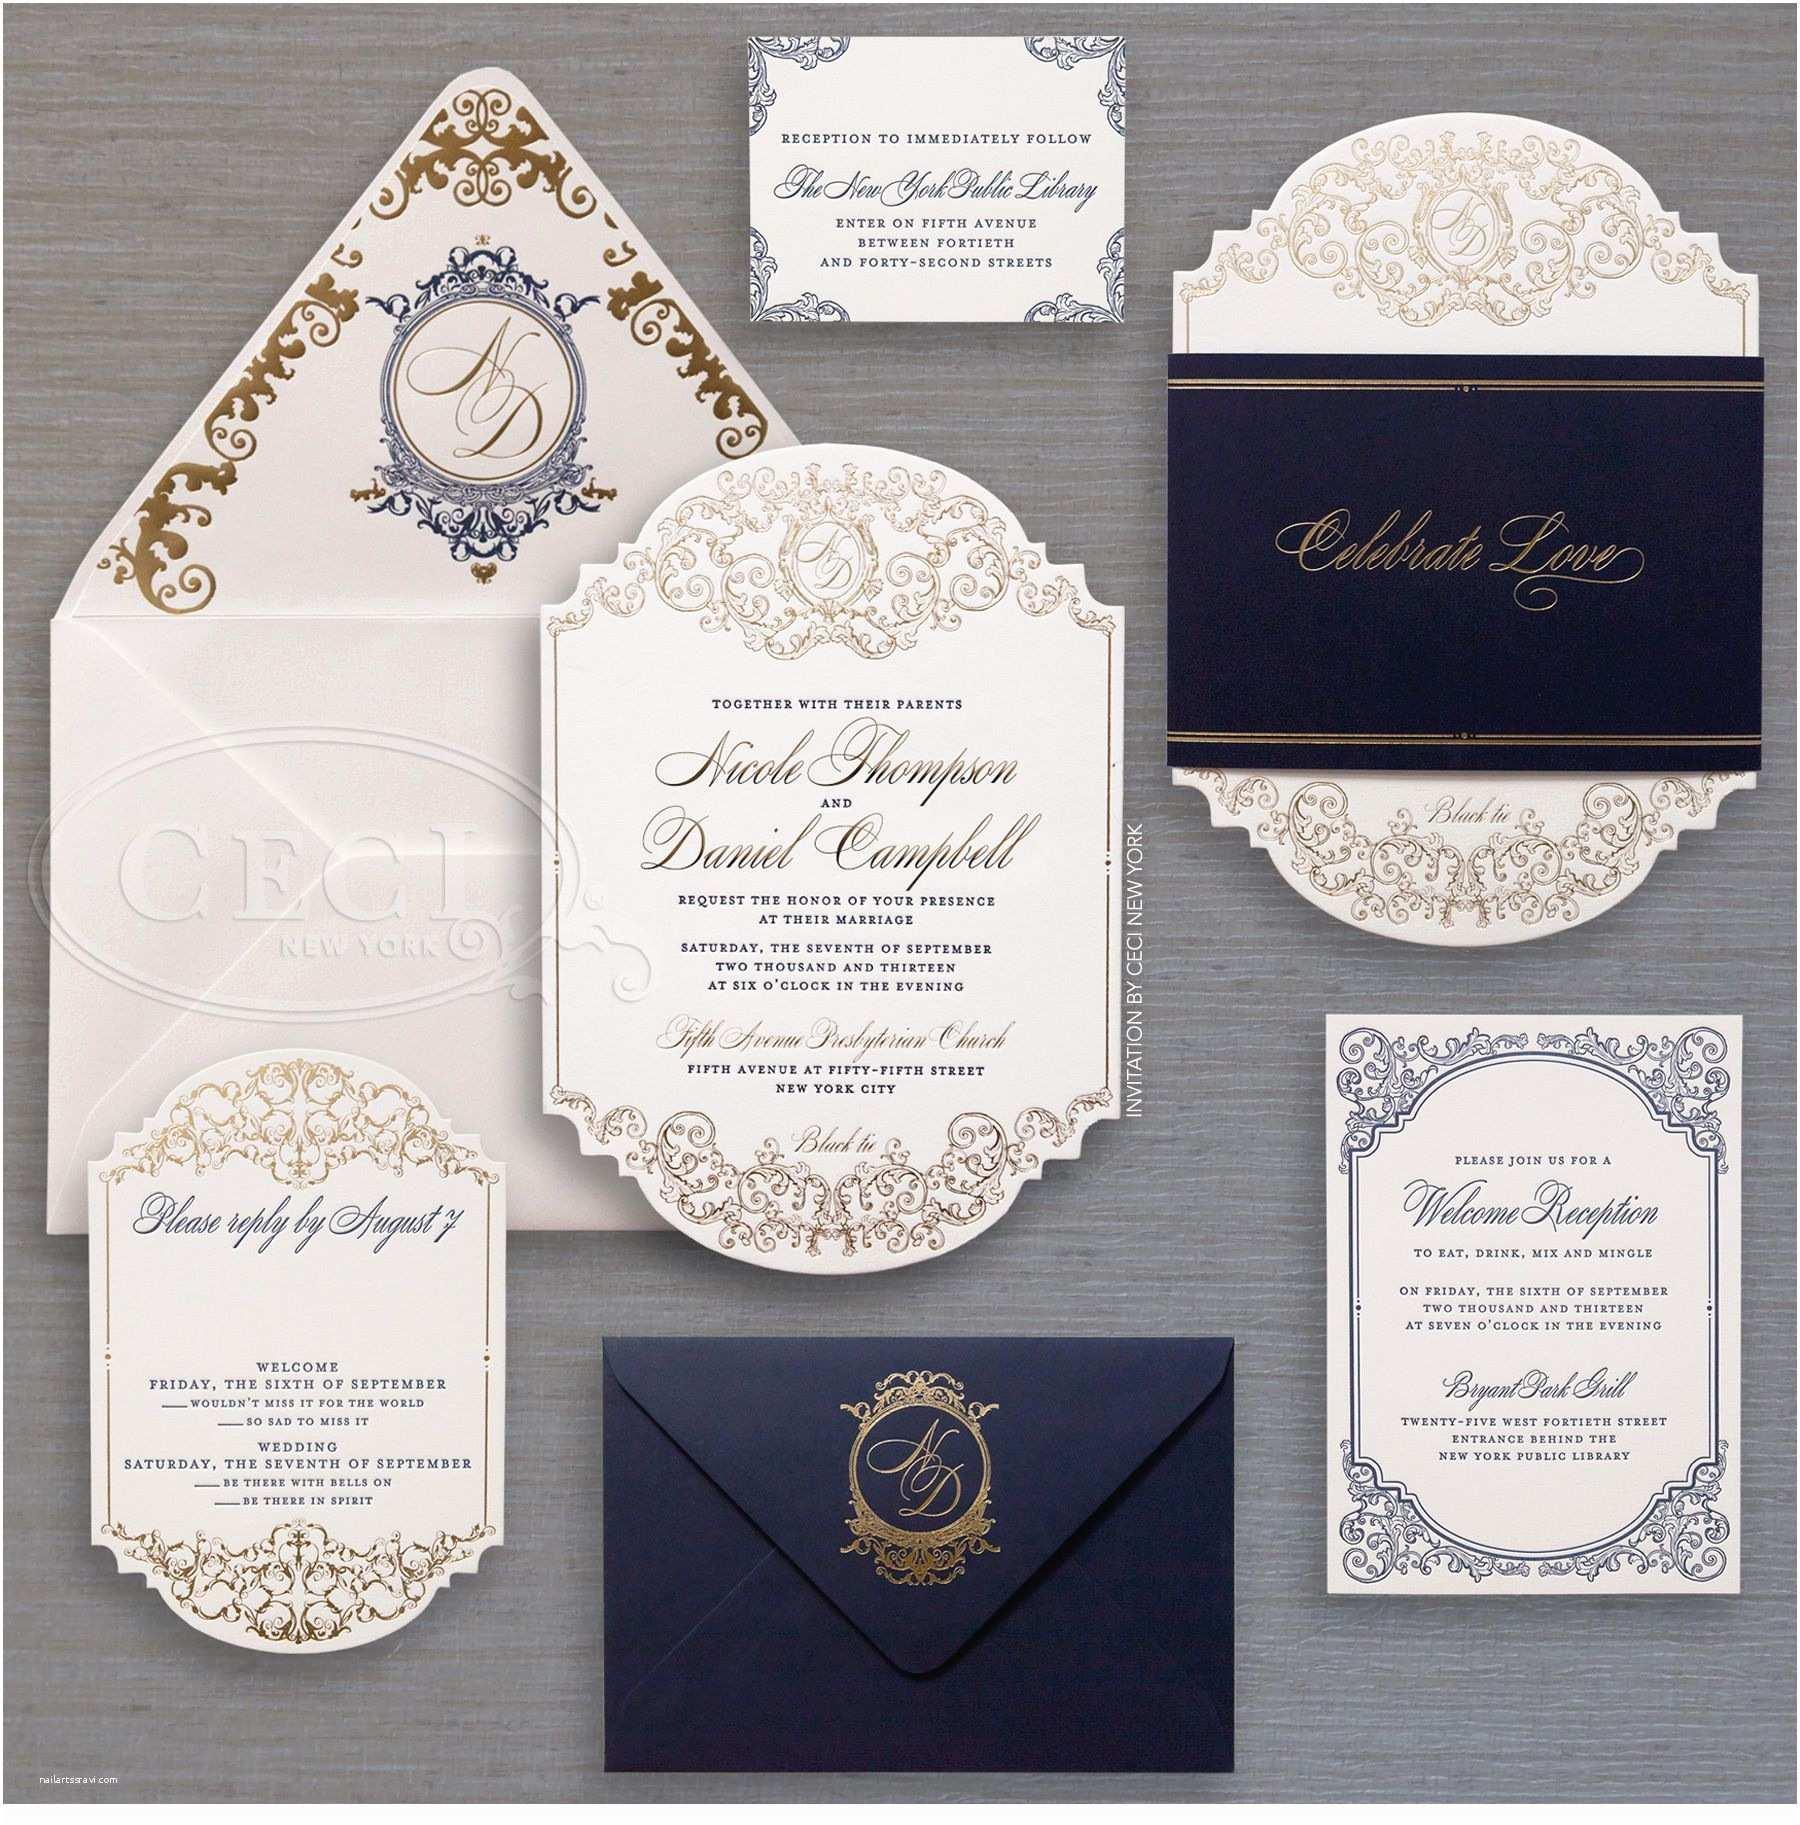 Wedding Invitations Nyc Luxury Wedding Invitations by Ceci New York